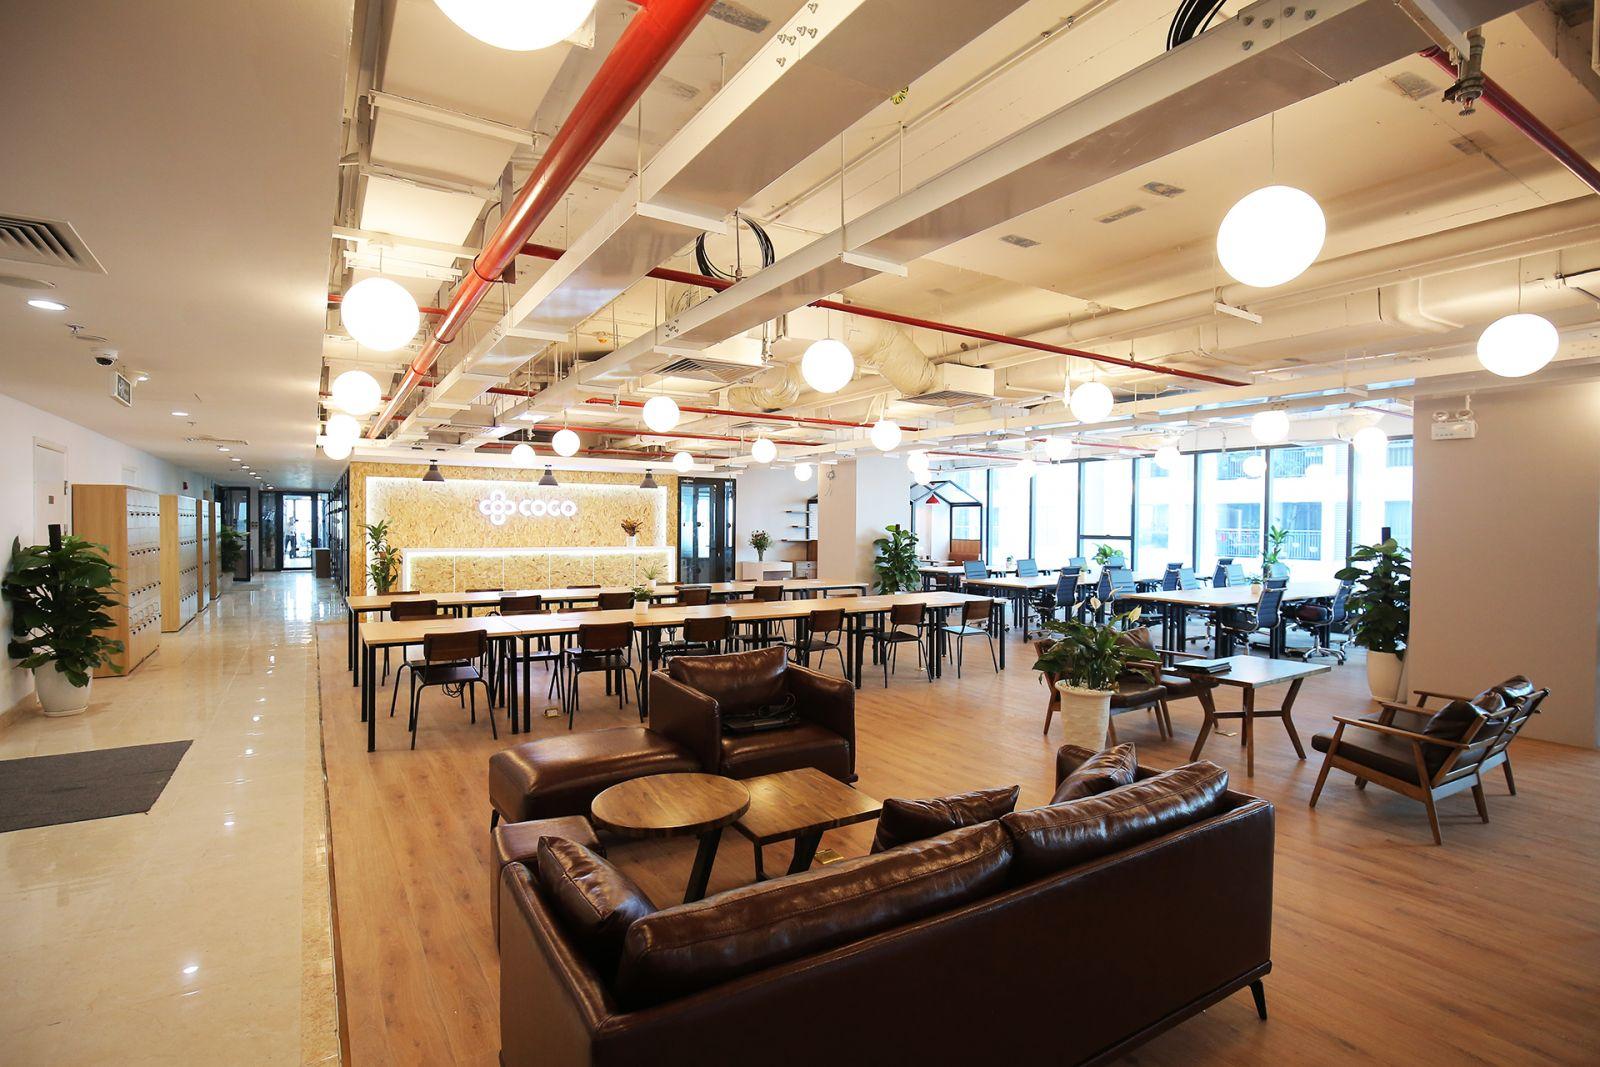 Văn phòng Cogo - Coworking Space